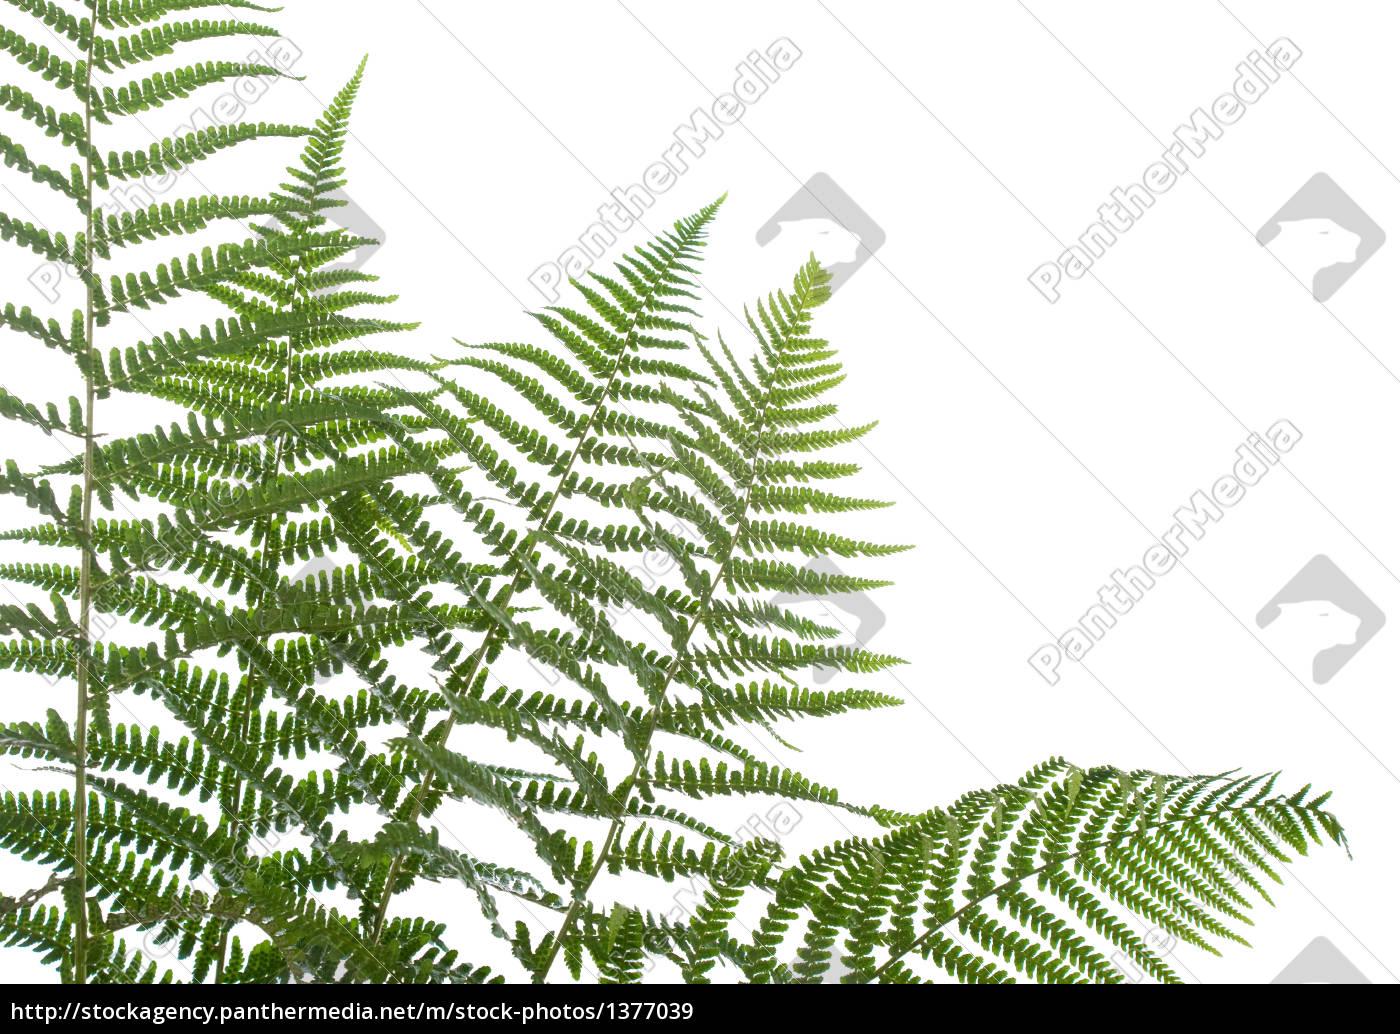 border, of, ferns - 1377039